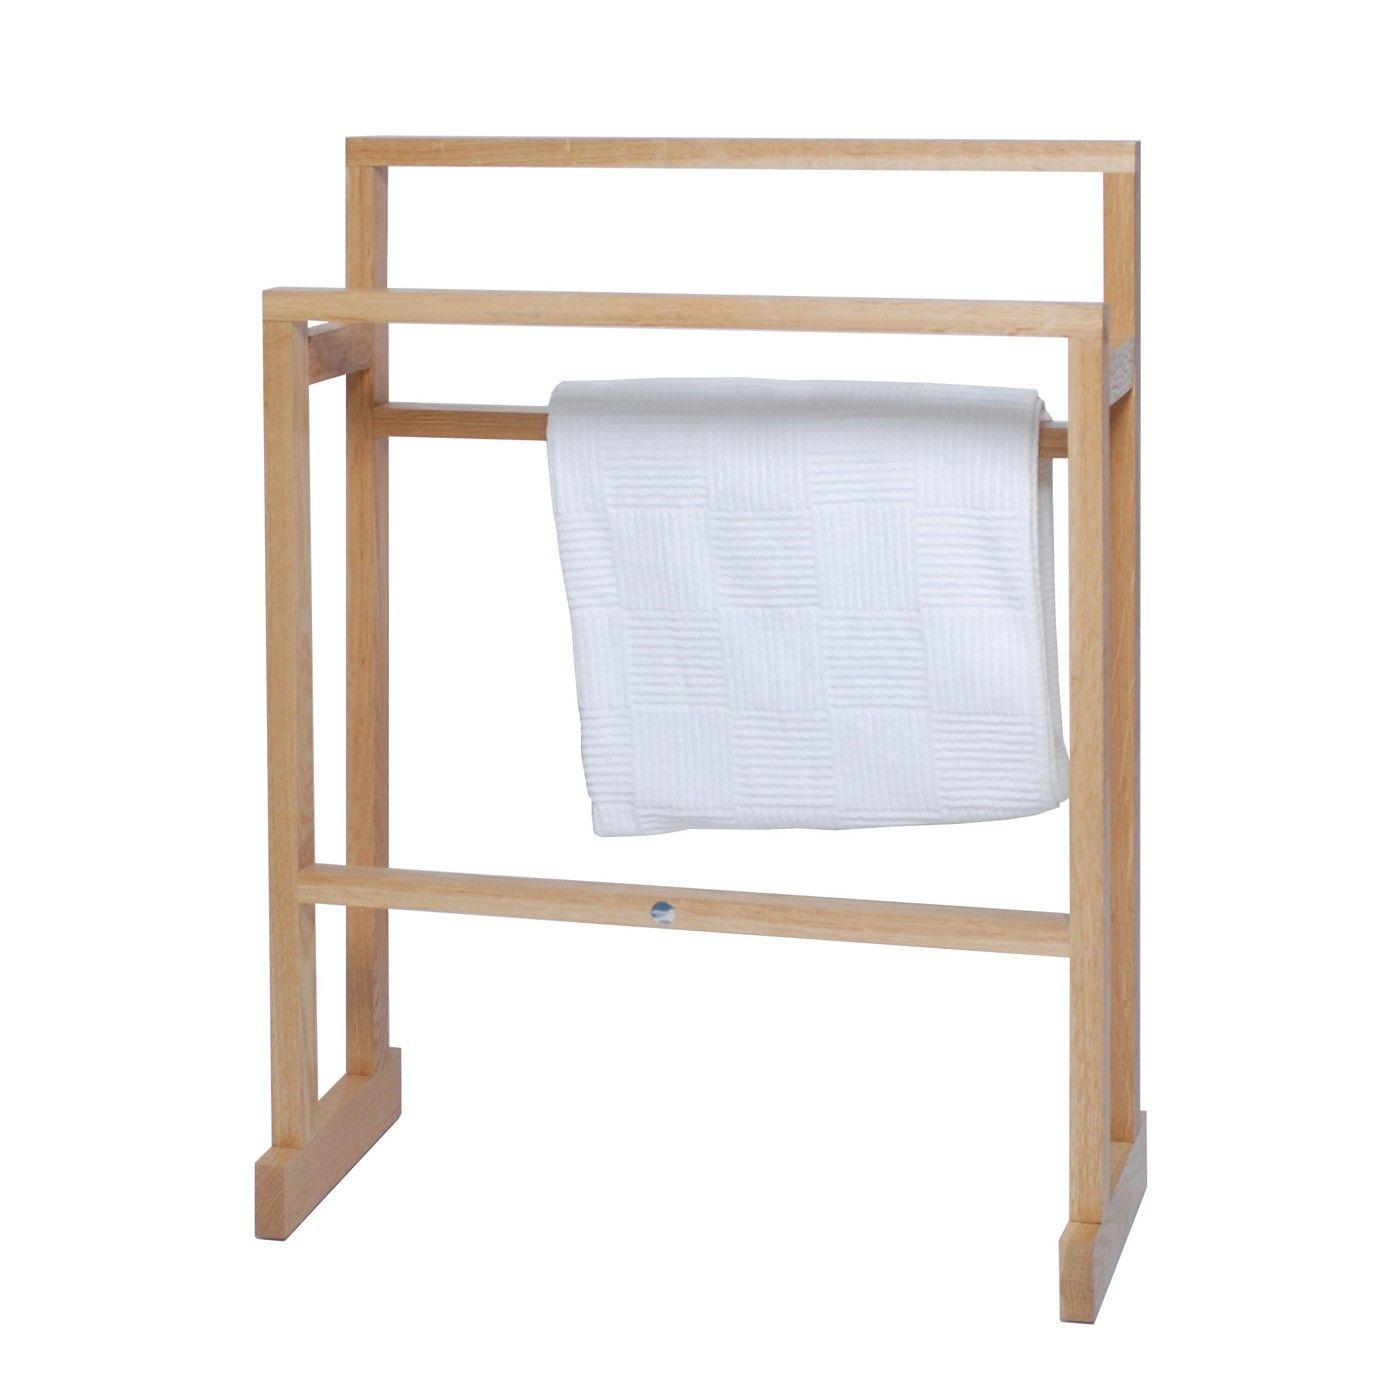 Image result for towel rail wm pinterest towel rail towels